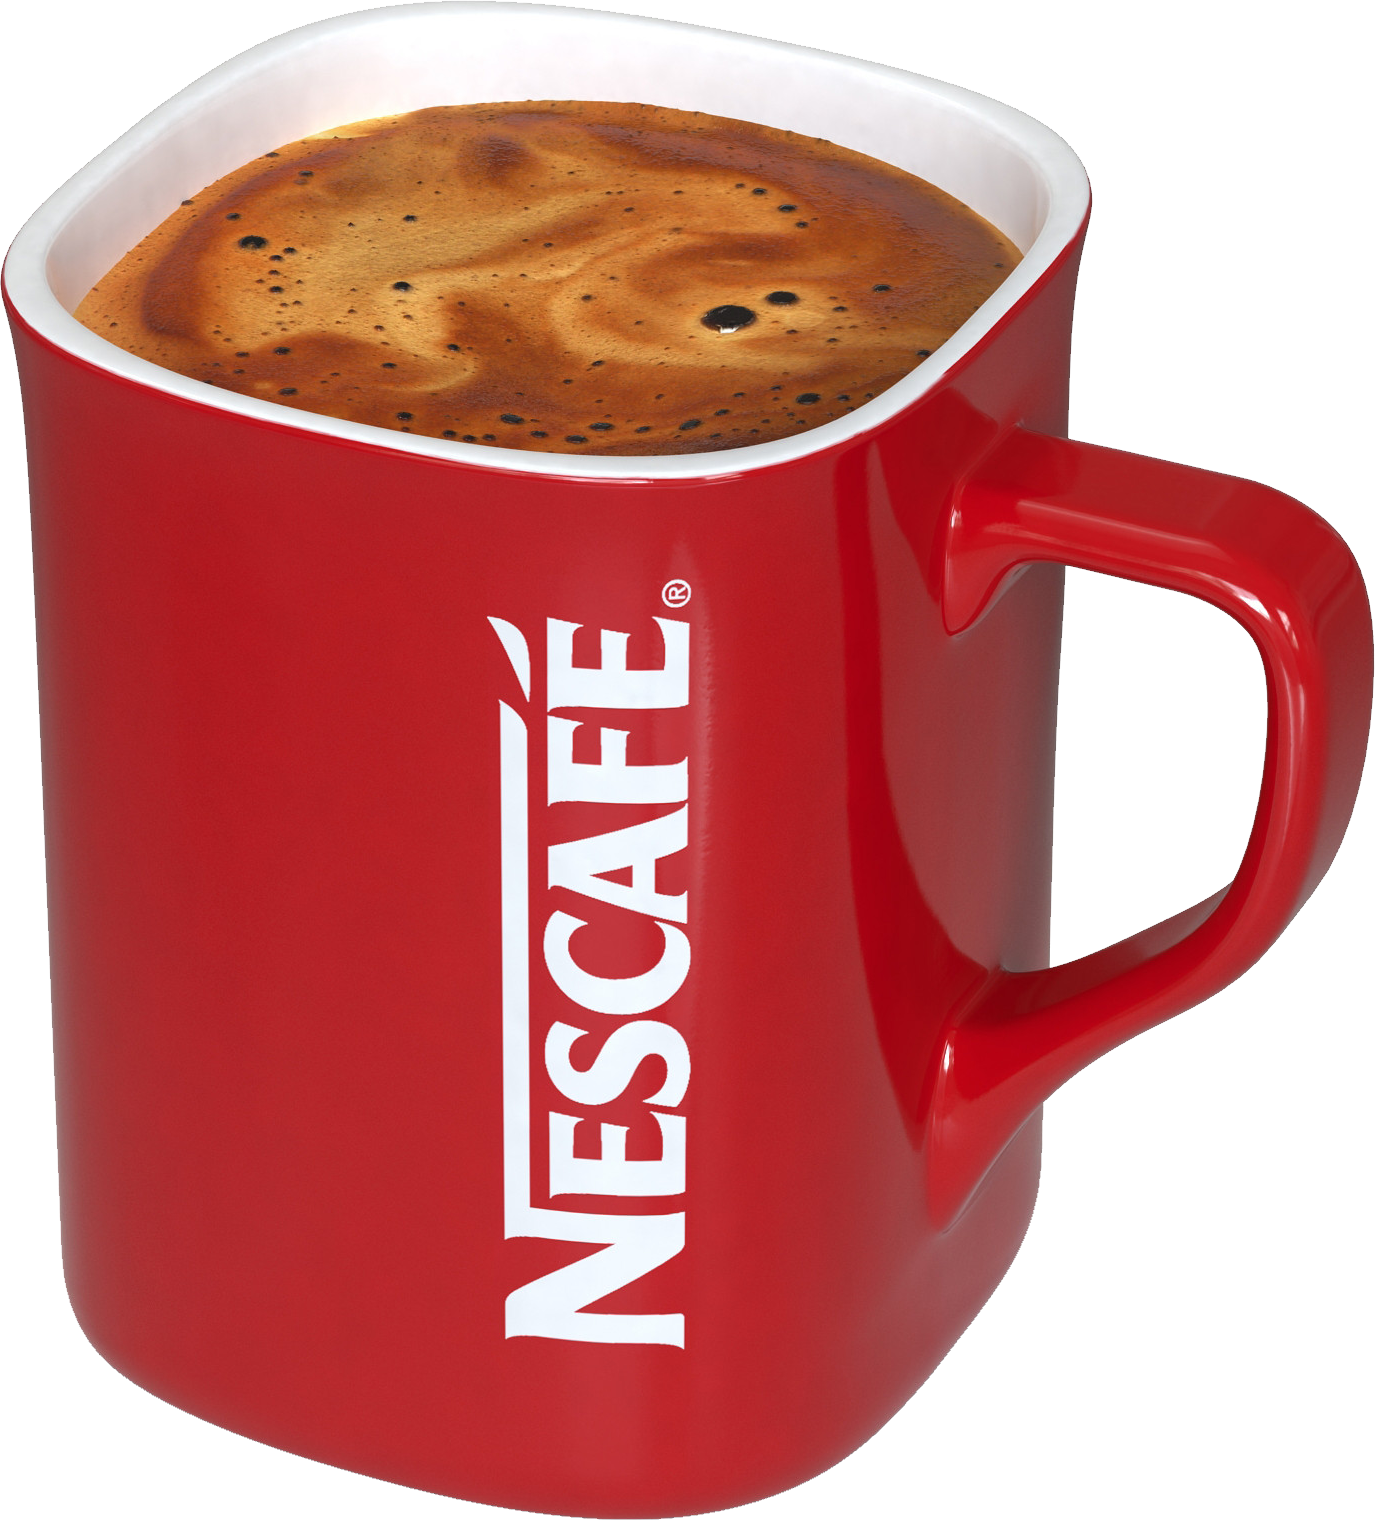 Nescafe Red Mug Coffee Png Png Image You Can Download Png Image Nescafe Red Mug Coffee Png Free Png Image Nescafe Red Mug Coffee Png In 2020 Coffee Png Nescafe Mugs